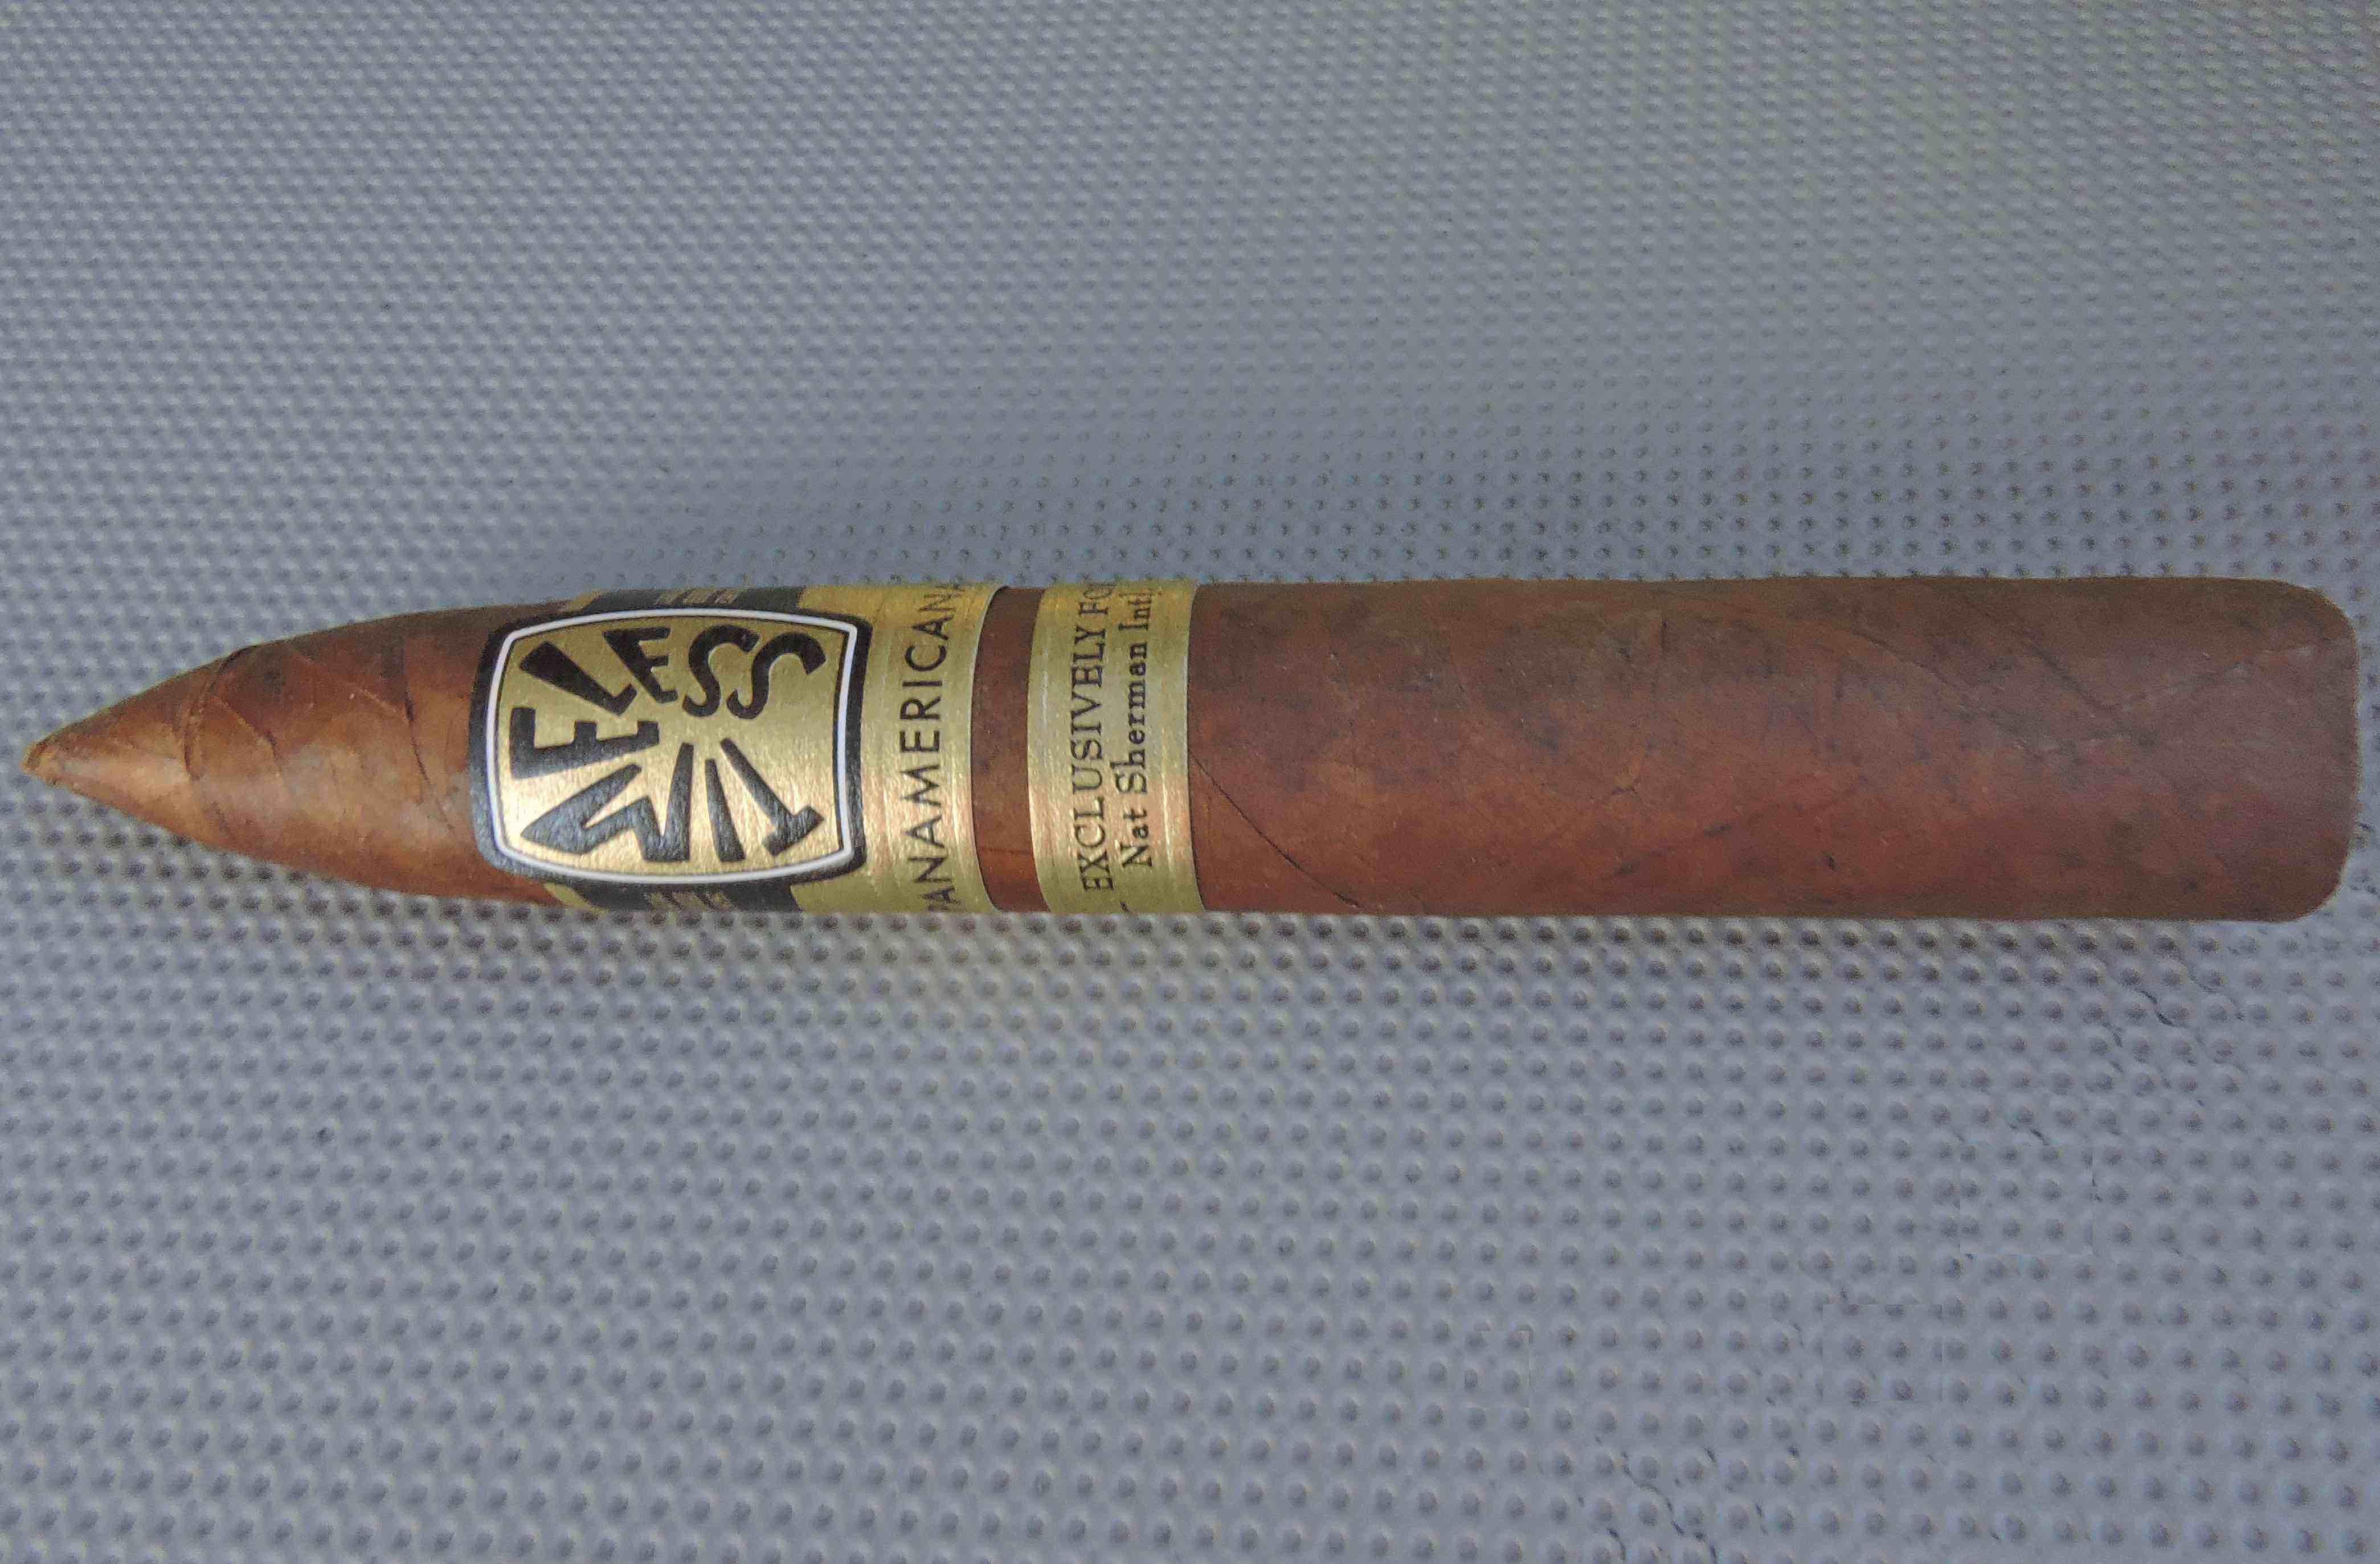 Agile Cigar Review: Nat Sherman Panamericana Belicoso Fino